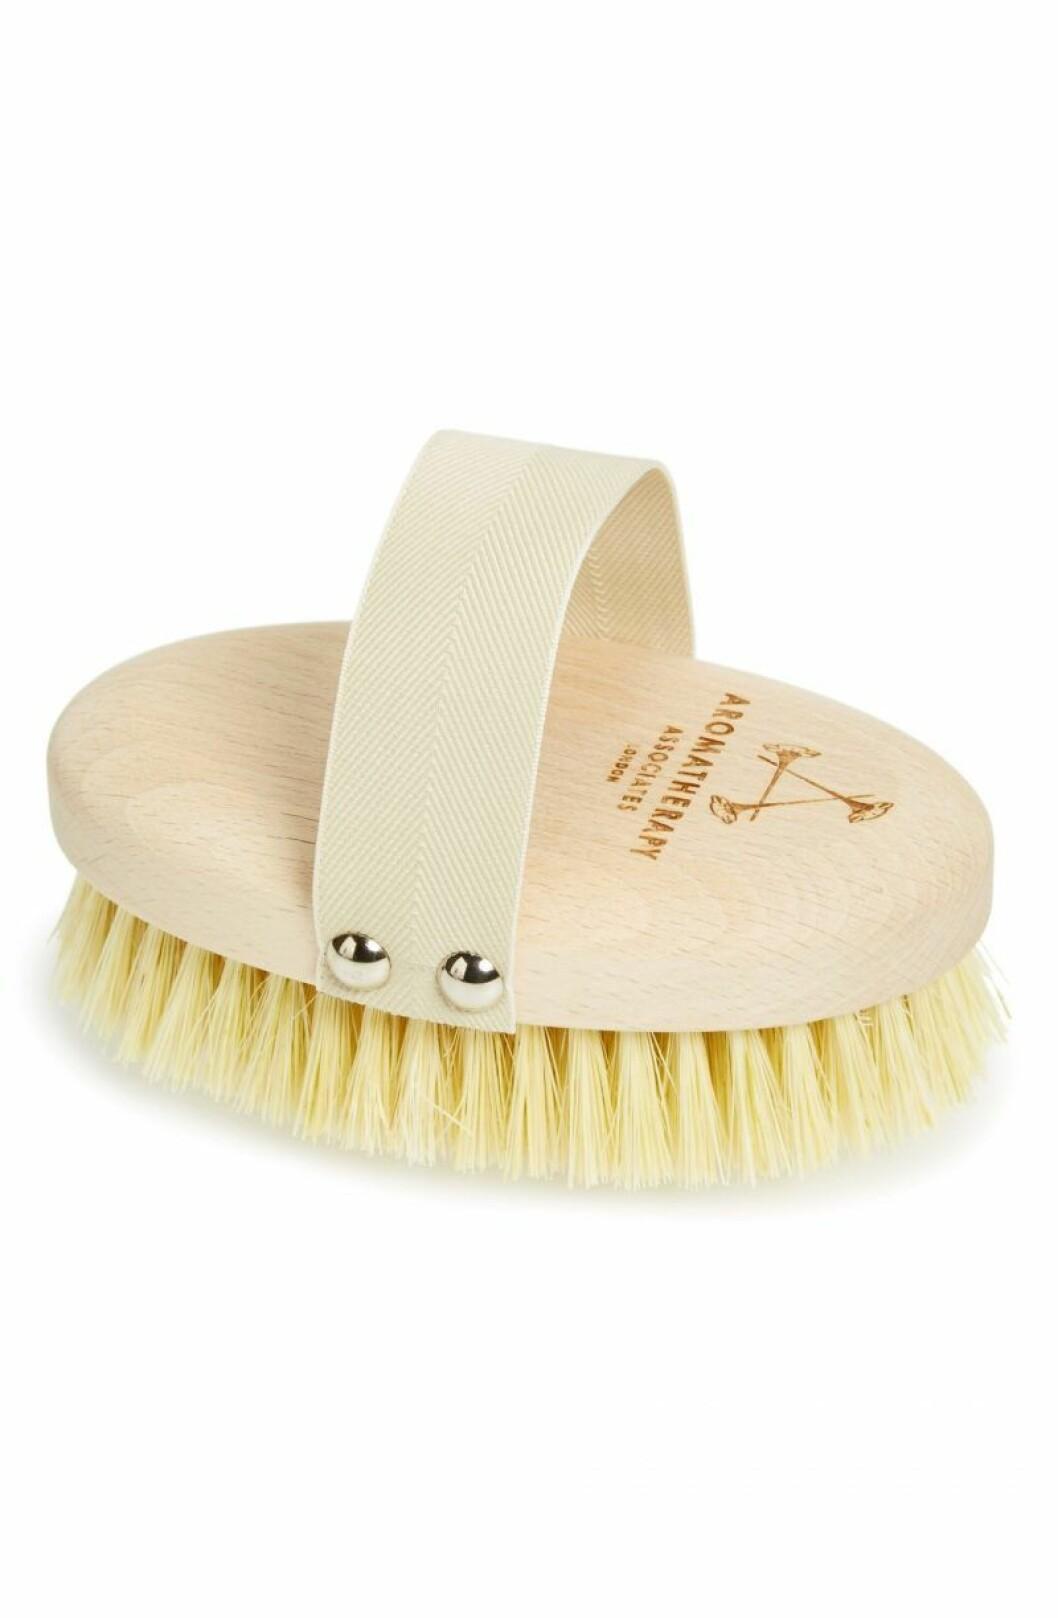 Body brush från Aromatherapy Associates